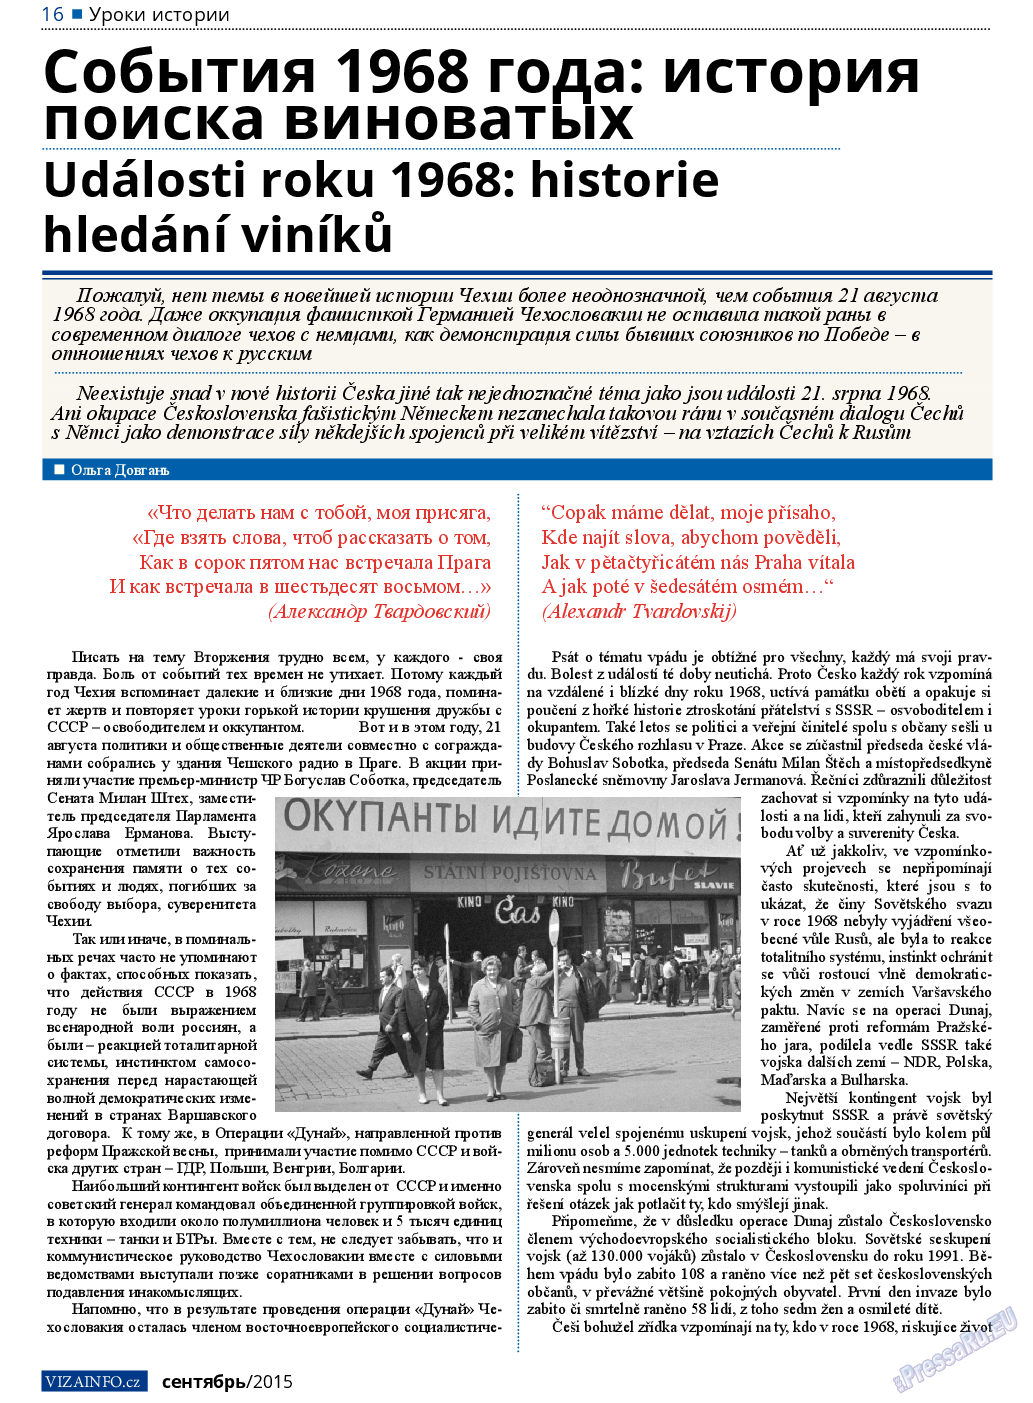 Vizainfo.cz (газета). 2015 год, номер 72, стр. 16